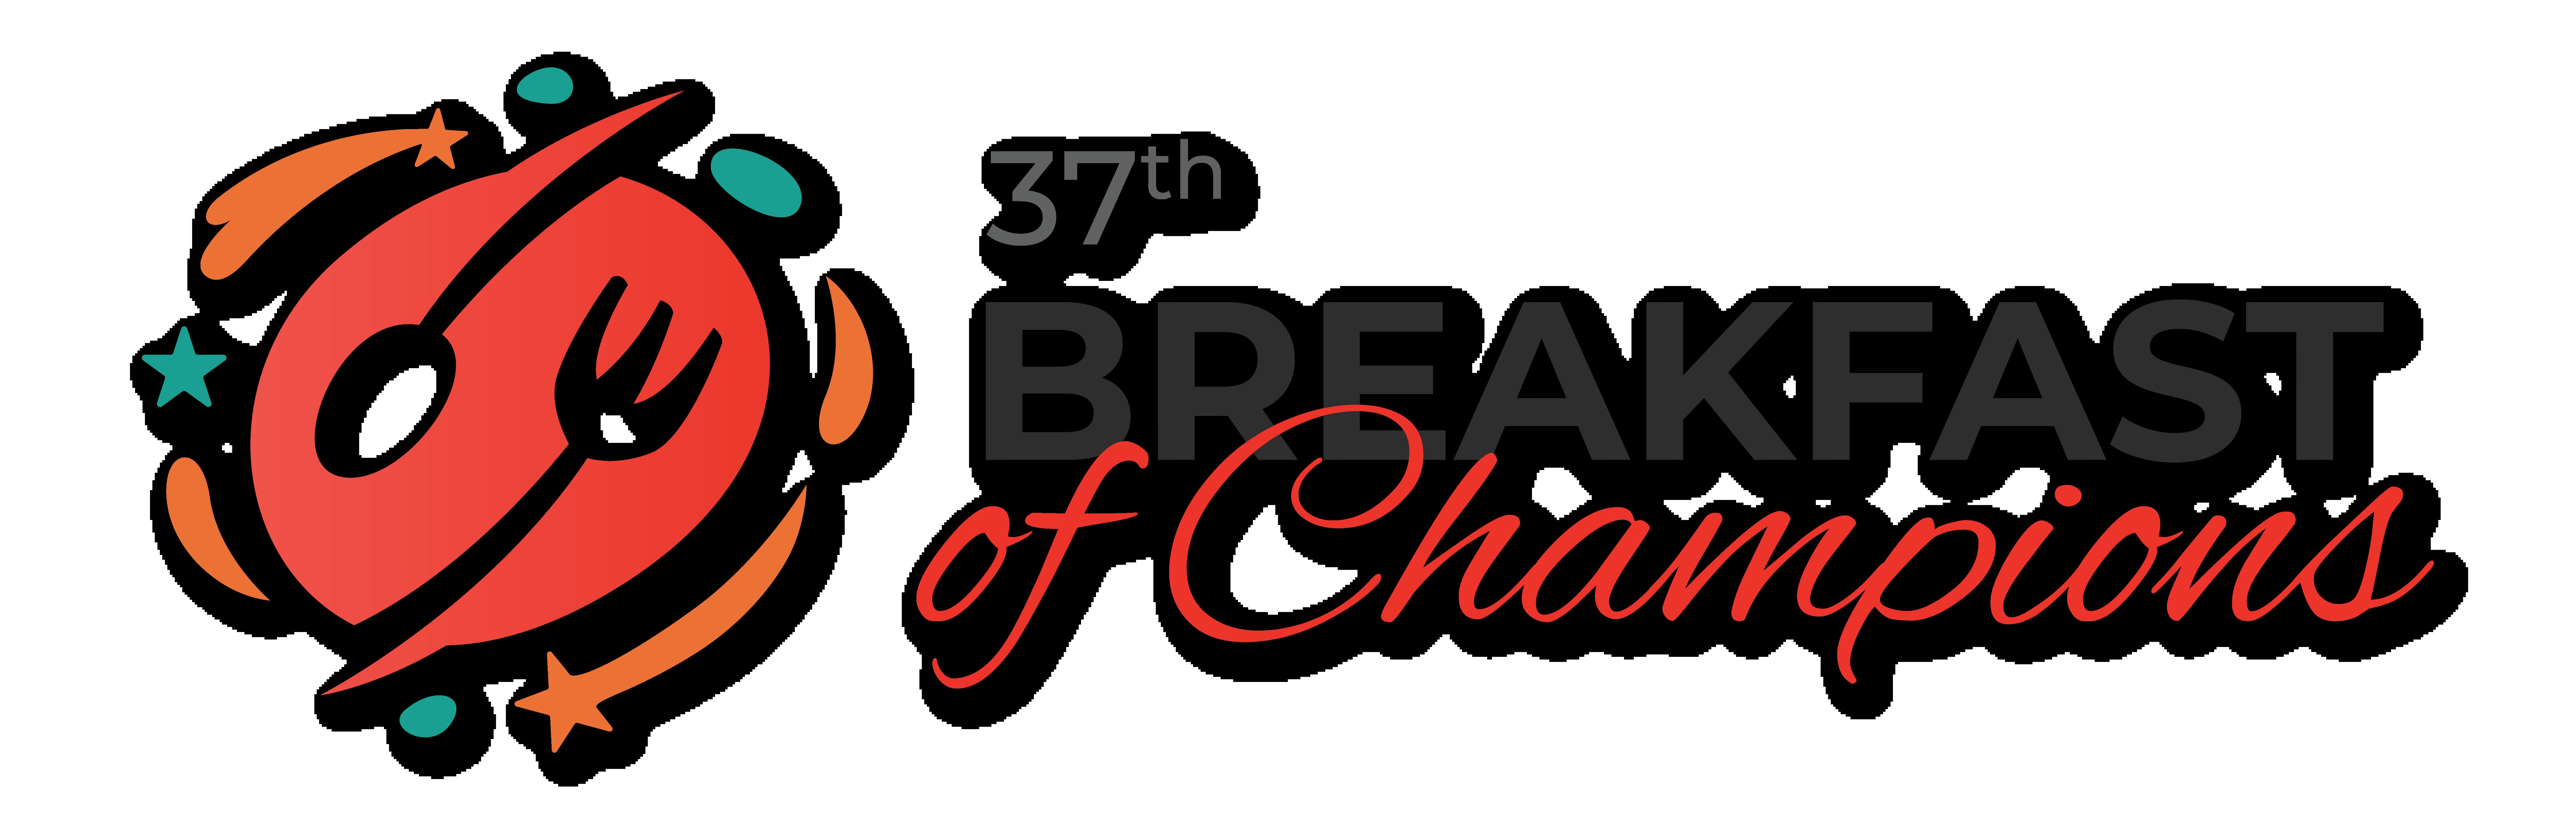 37th annual Breakfast of Champions logo